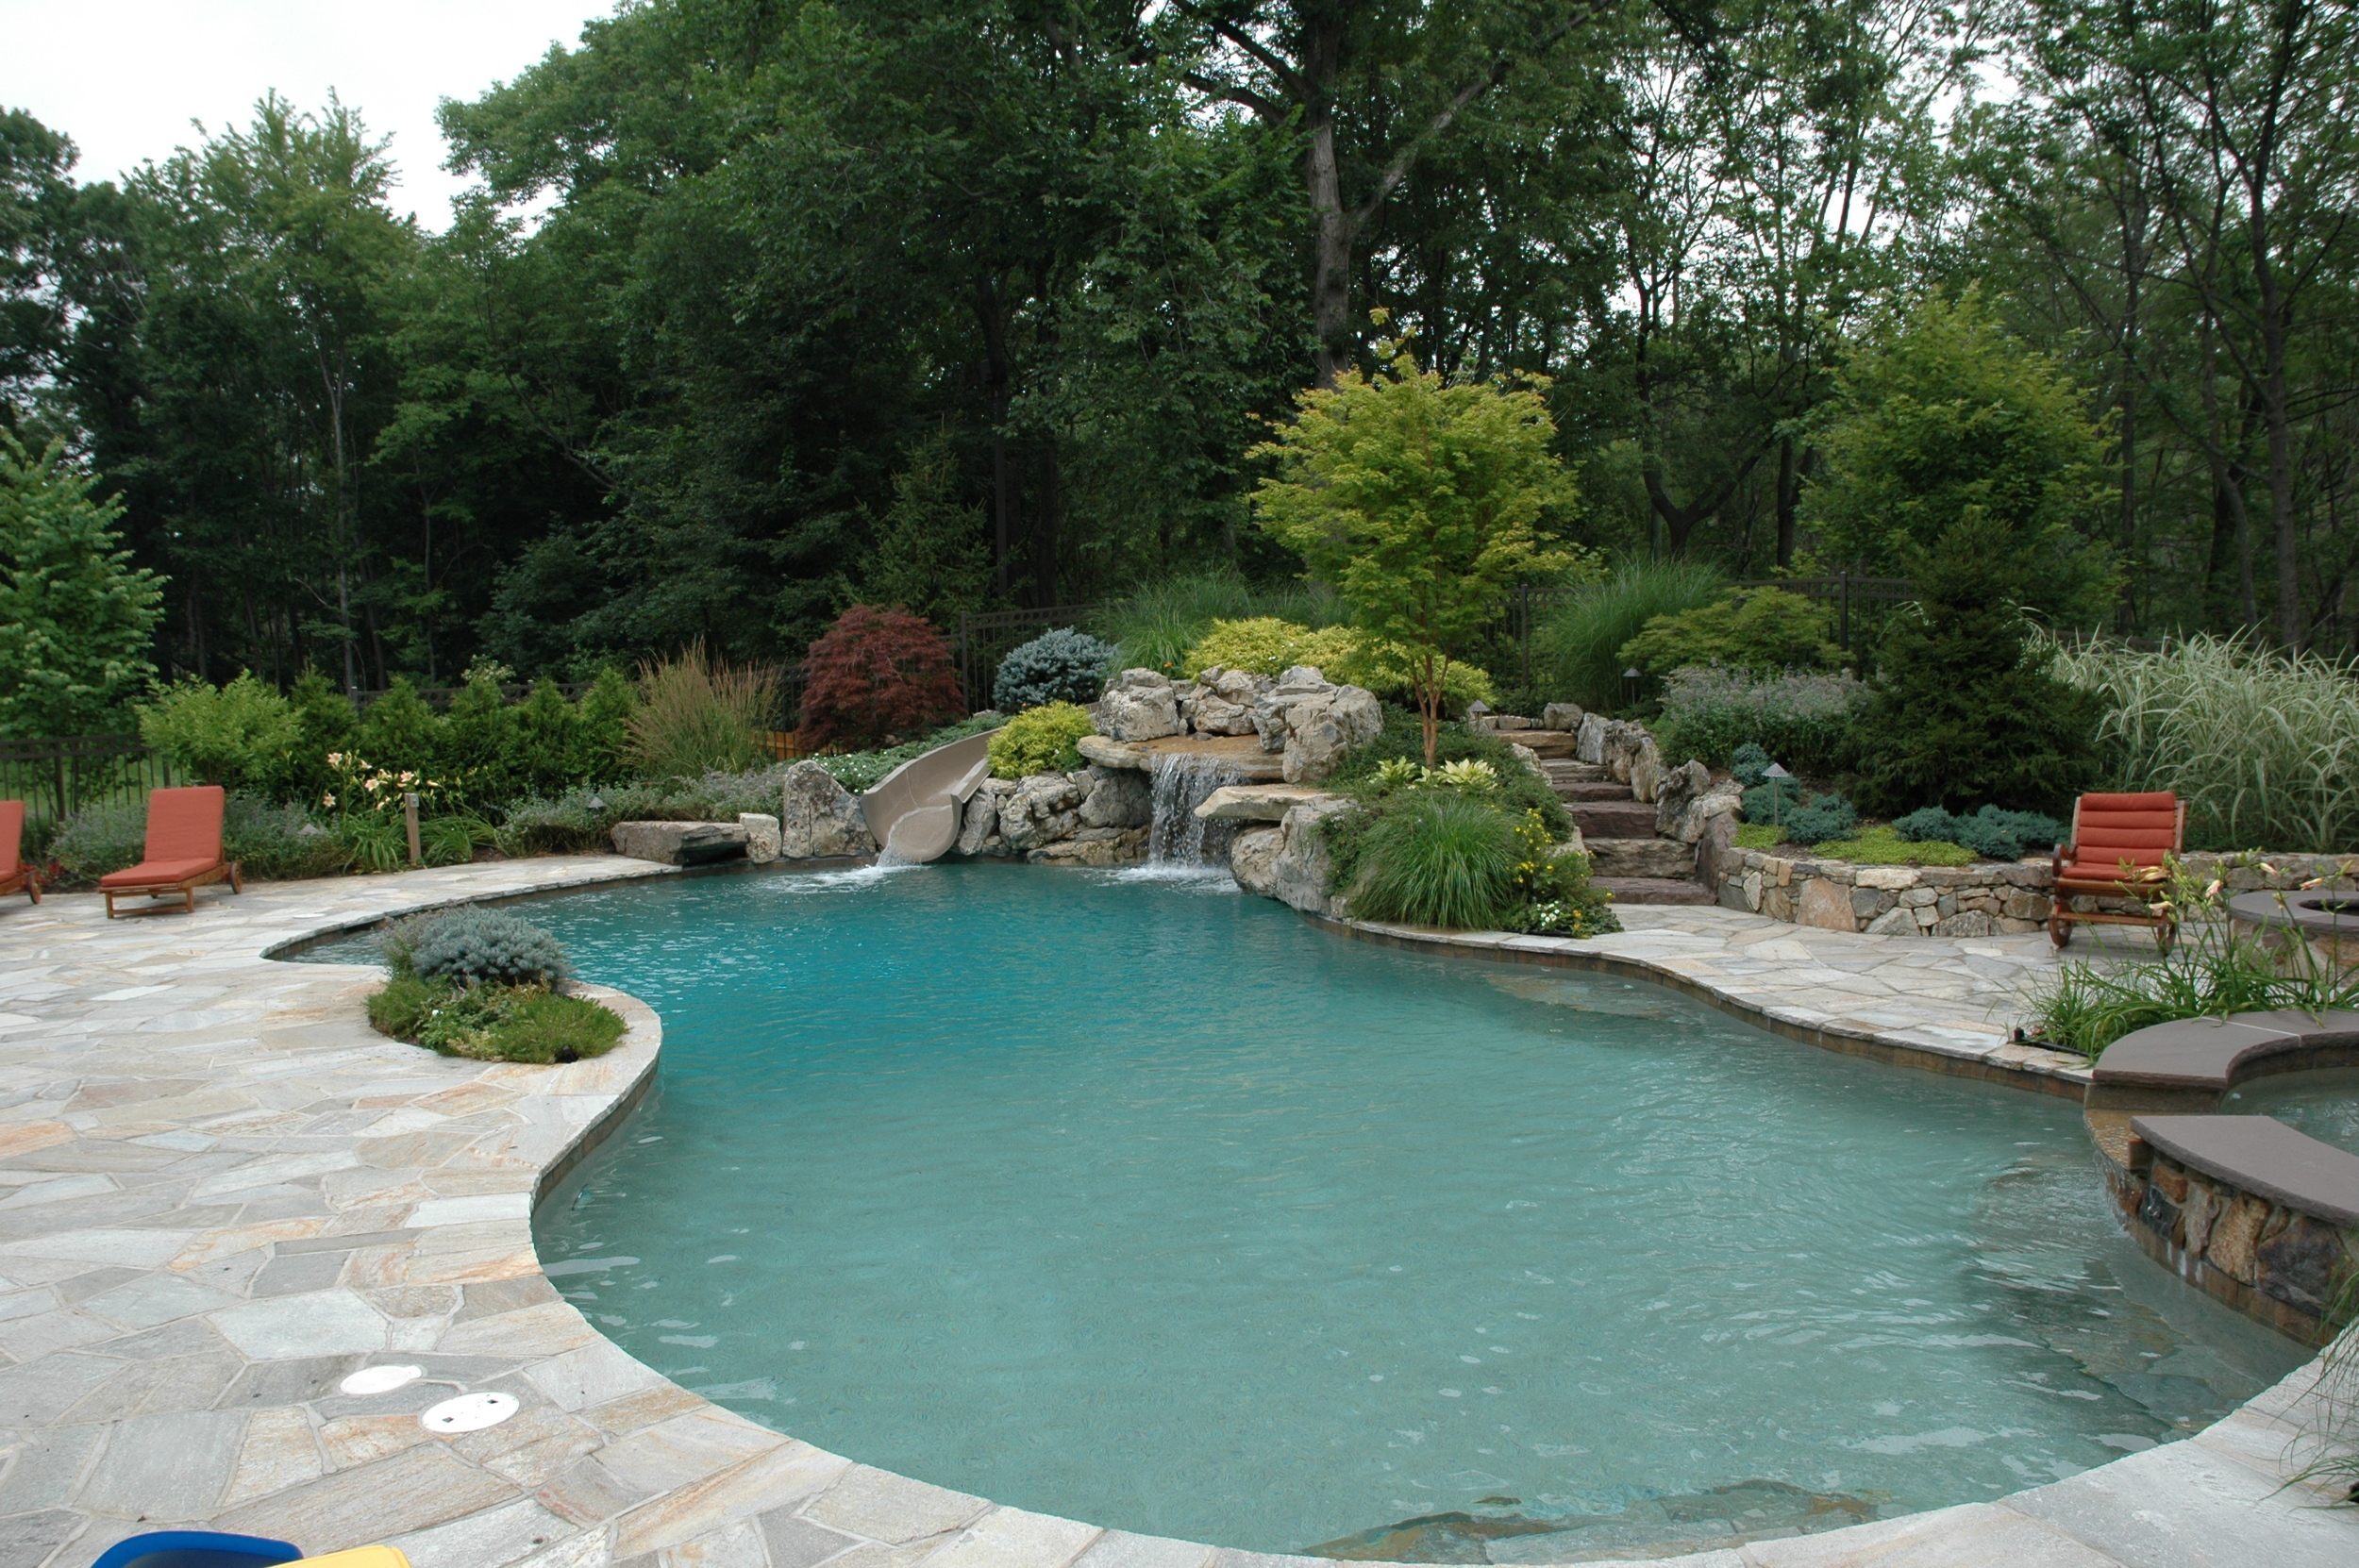 41 fantastic outdoor pool ideas